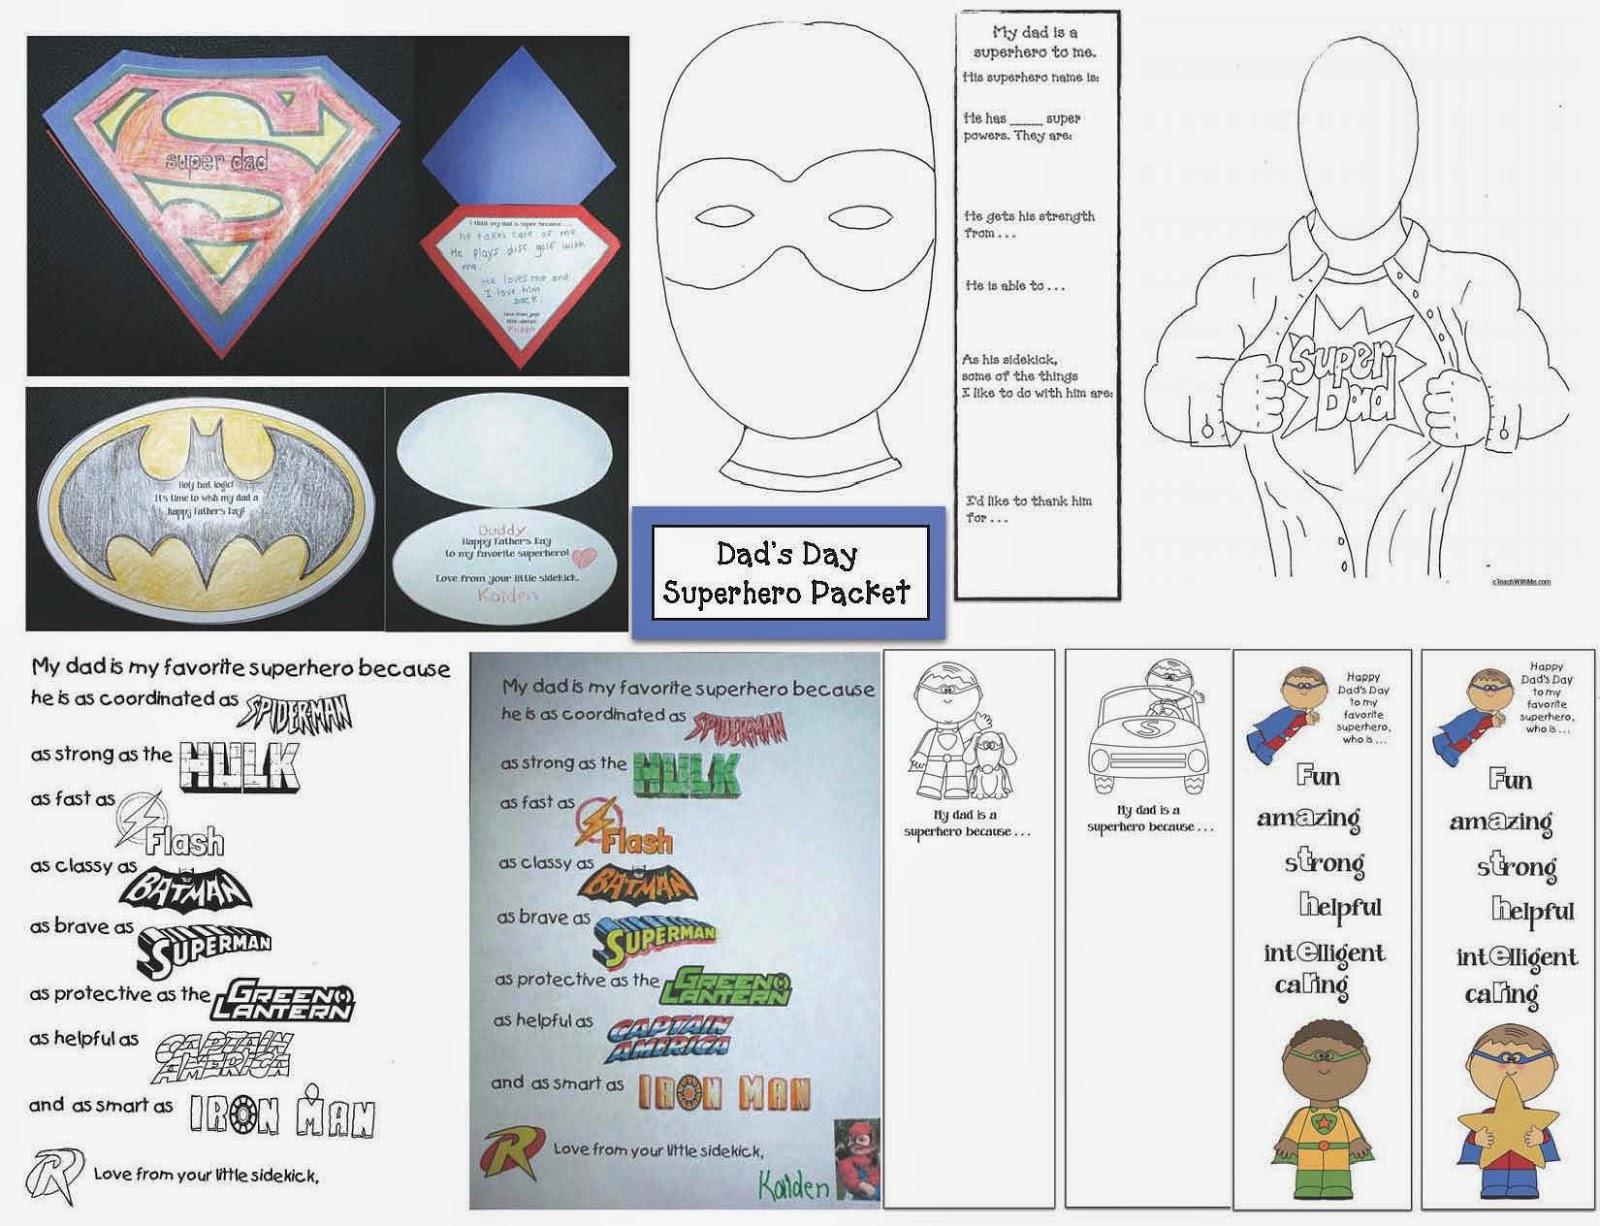 http://3.bp.blogspot.com/-VvAnrpxTVEo/U6ycKM00-pI/AAAAAAAAKyw/XlUj8LhfjQc/s1600/father%2527s+day+superhero+packet+cov+2.jpg